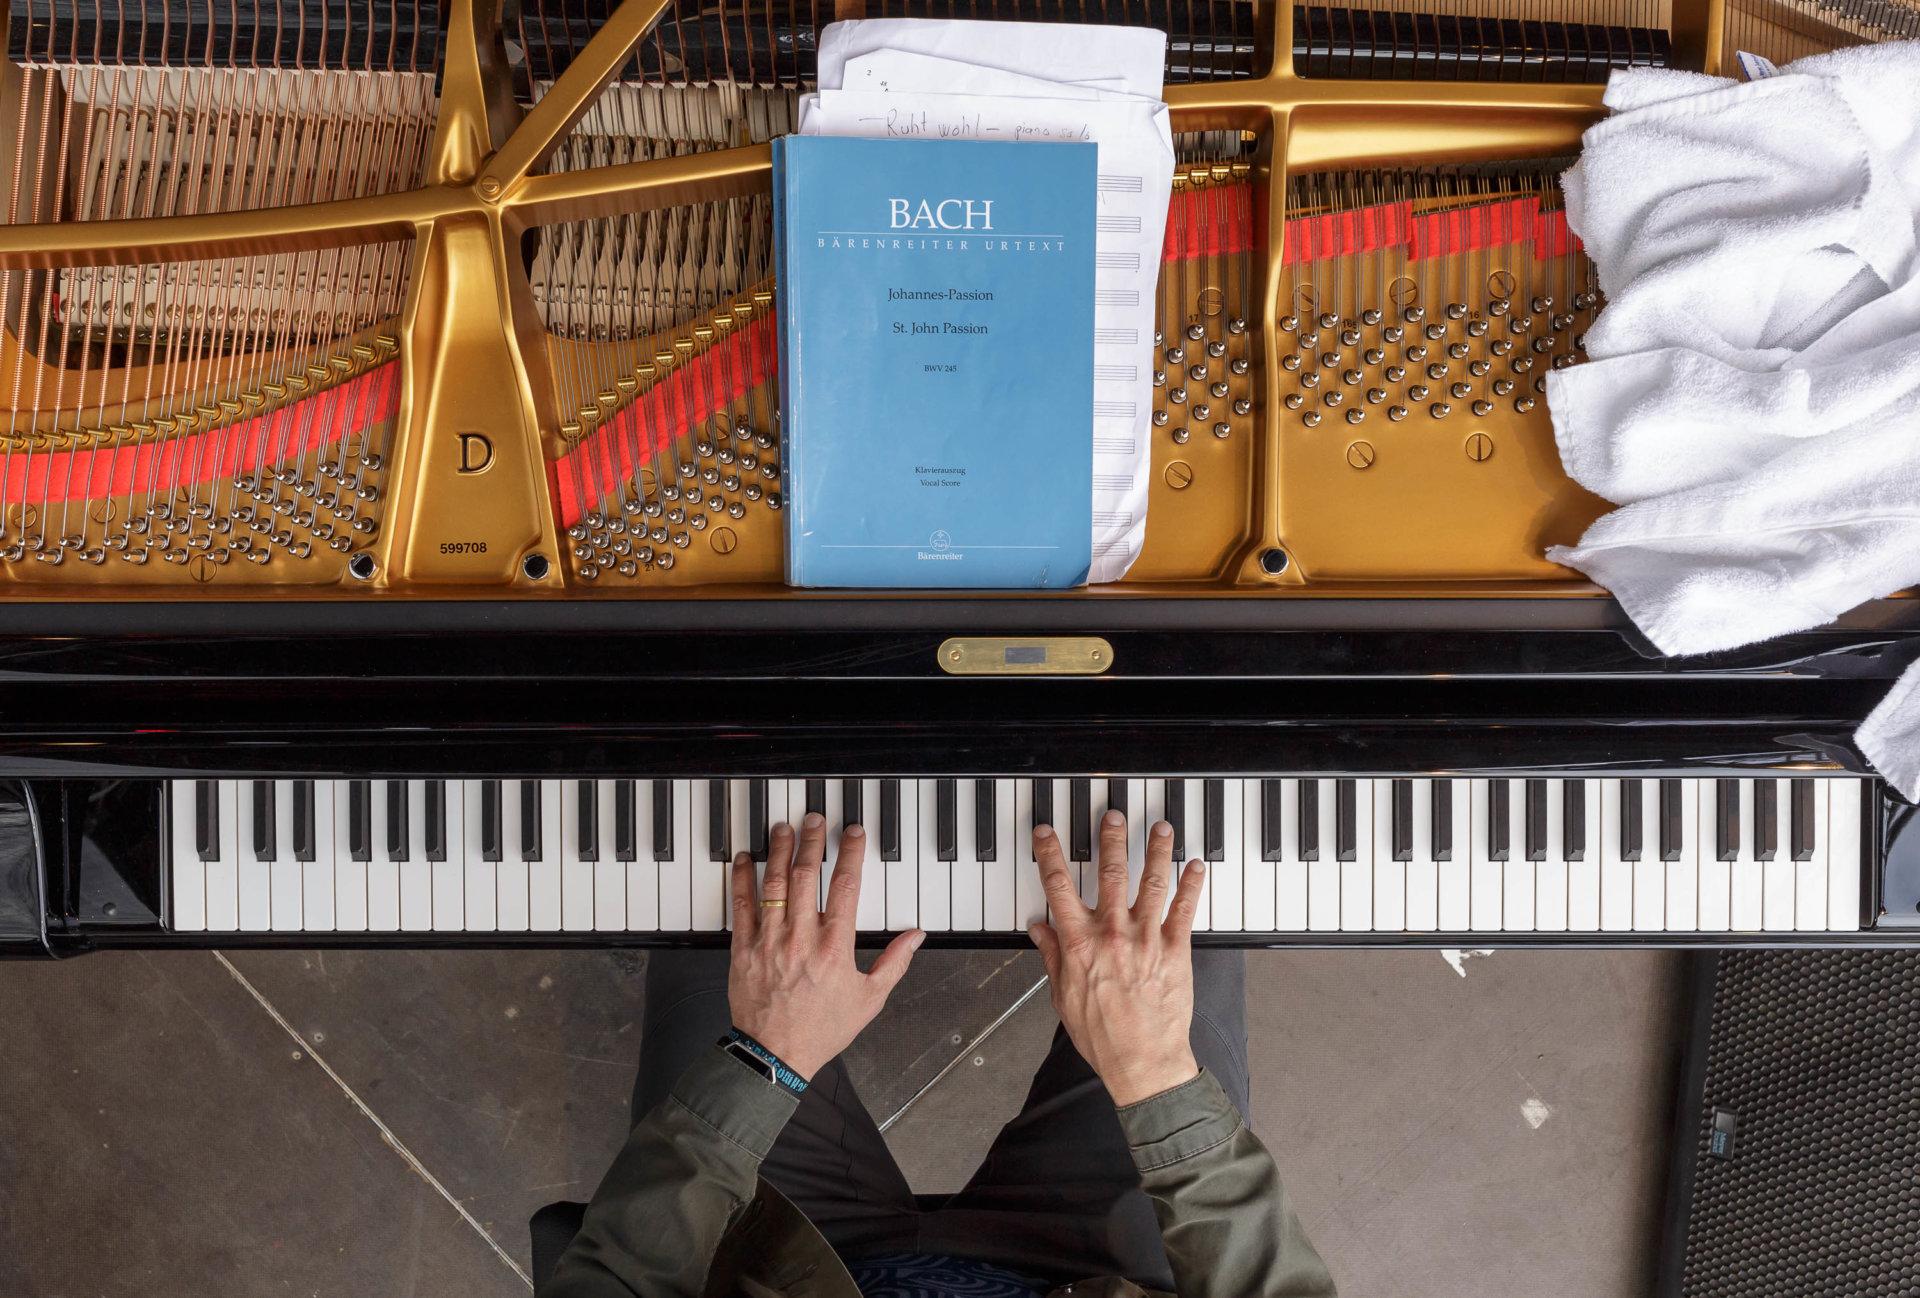 1, DRUCKEN!, Finnland, Hände, Iiro Rantala, Kultur, Künstler, MASTERBILD, Pianist, Projekt, Serie, arzt, jazz, klavier, konzert, meisterfinger, musik, musiker, piano, tasten